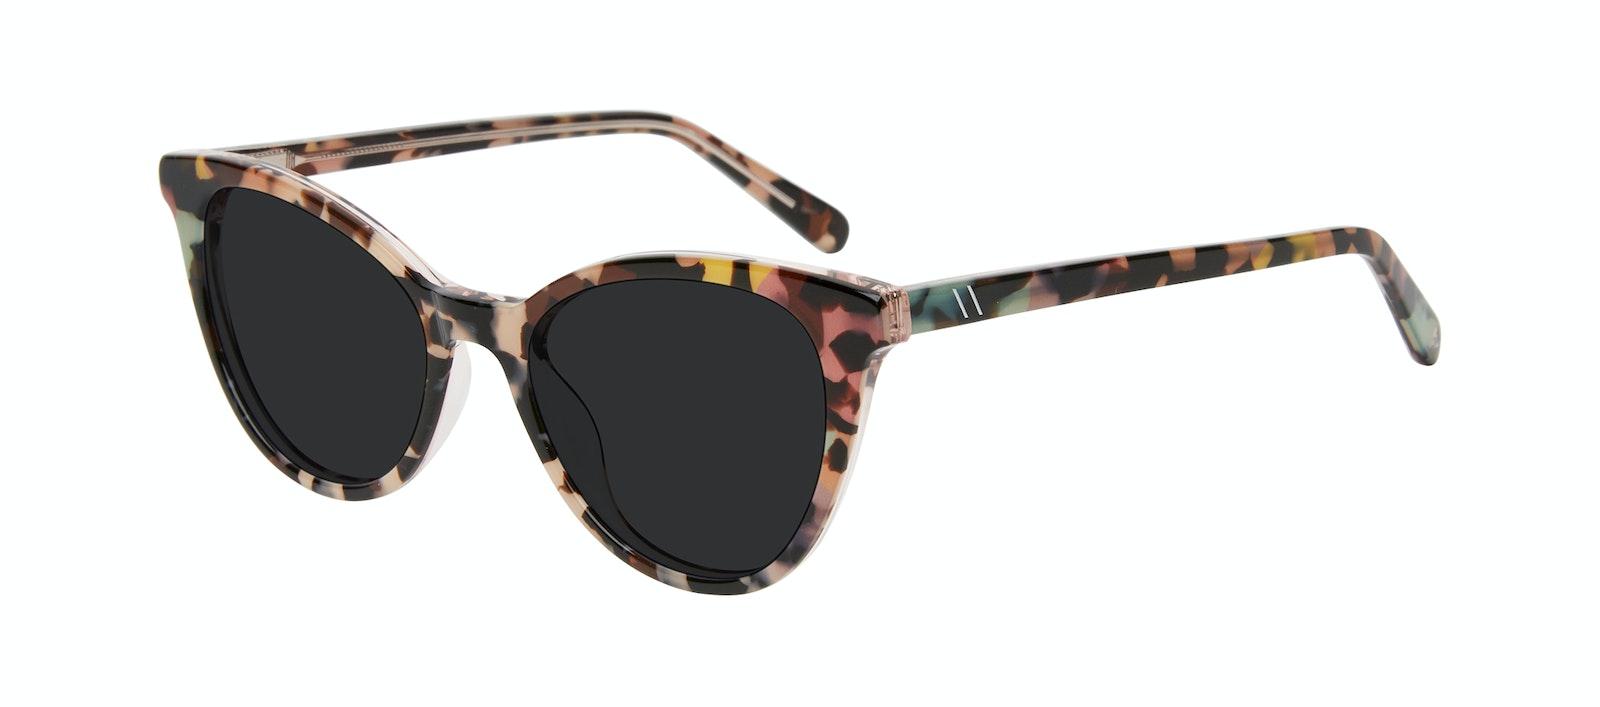 Affordable Fashion Glasses Cat Eye Sunglasses Women Victoire Pastel Tort Tilt